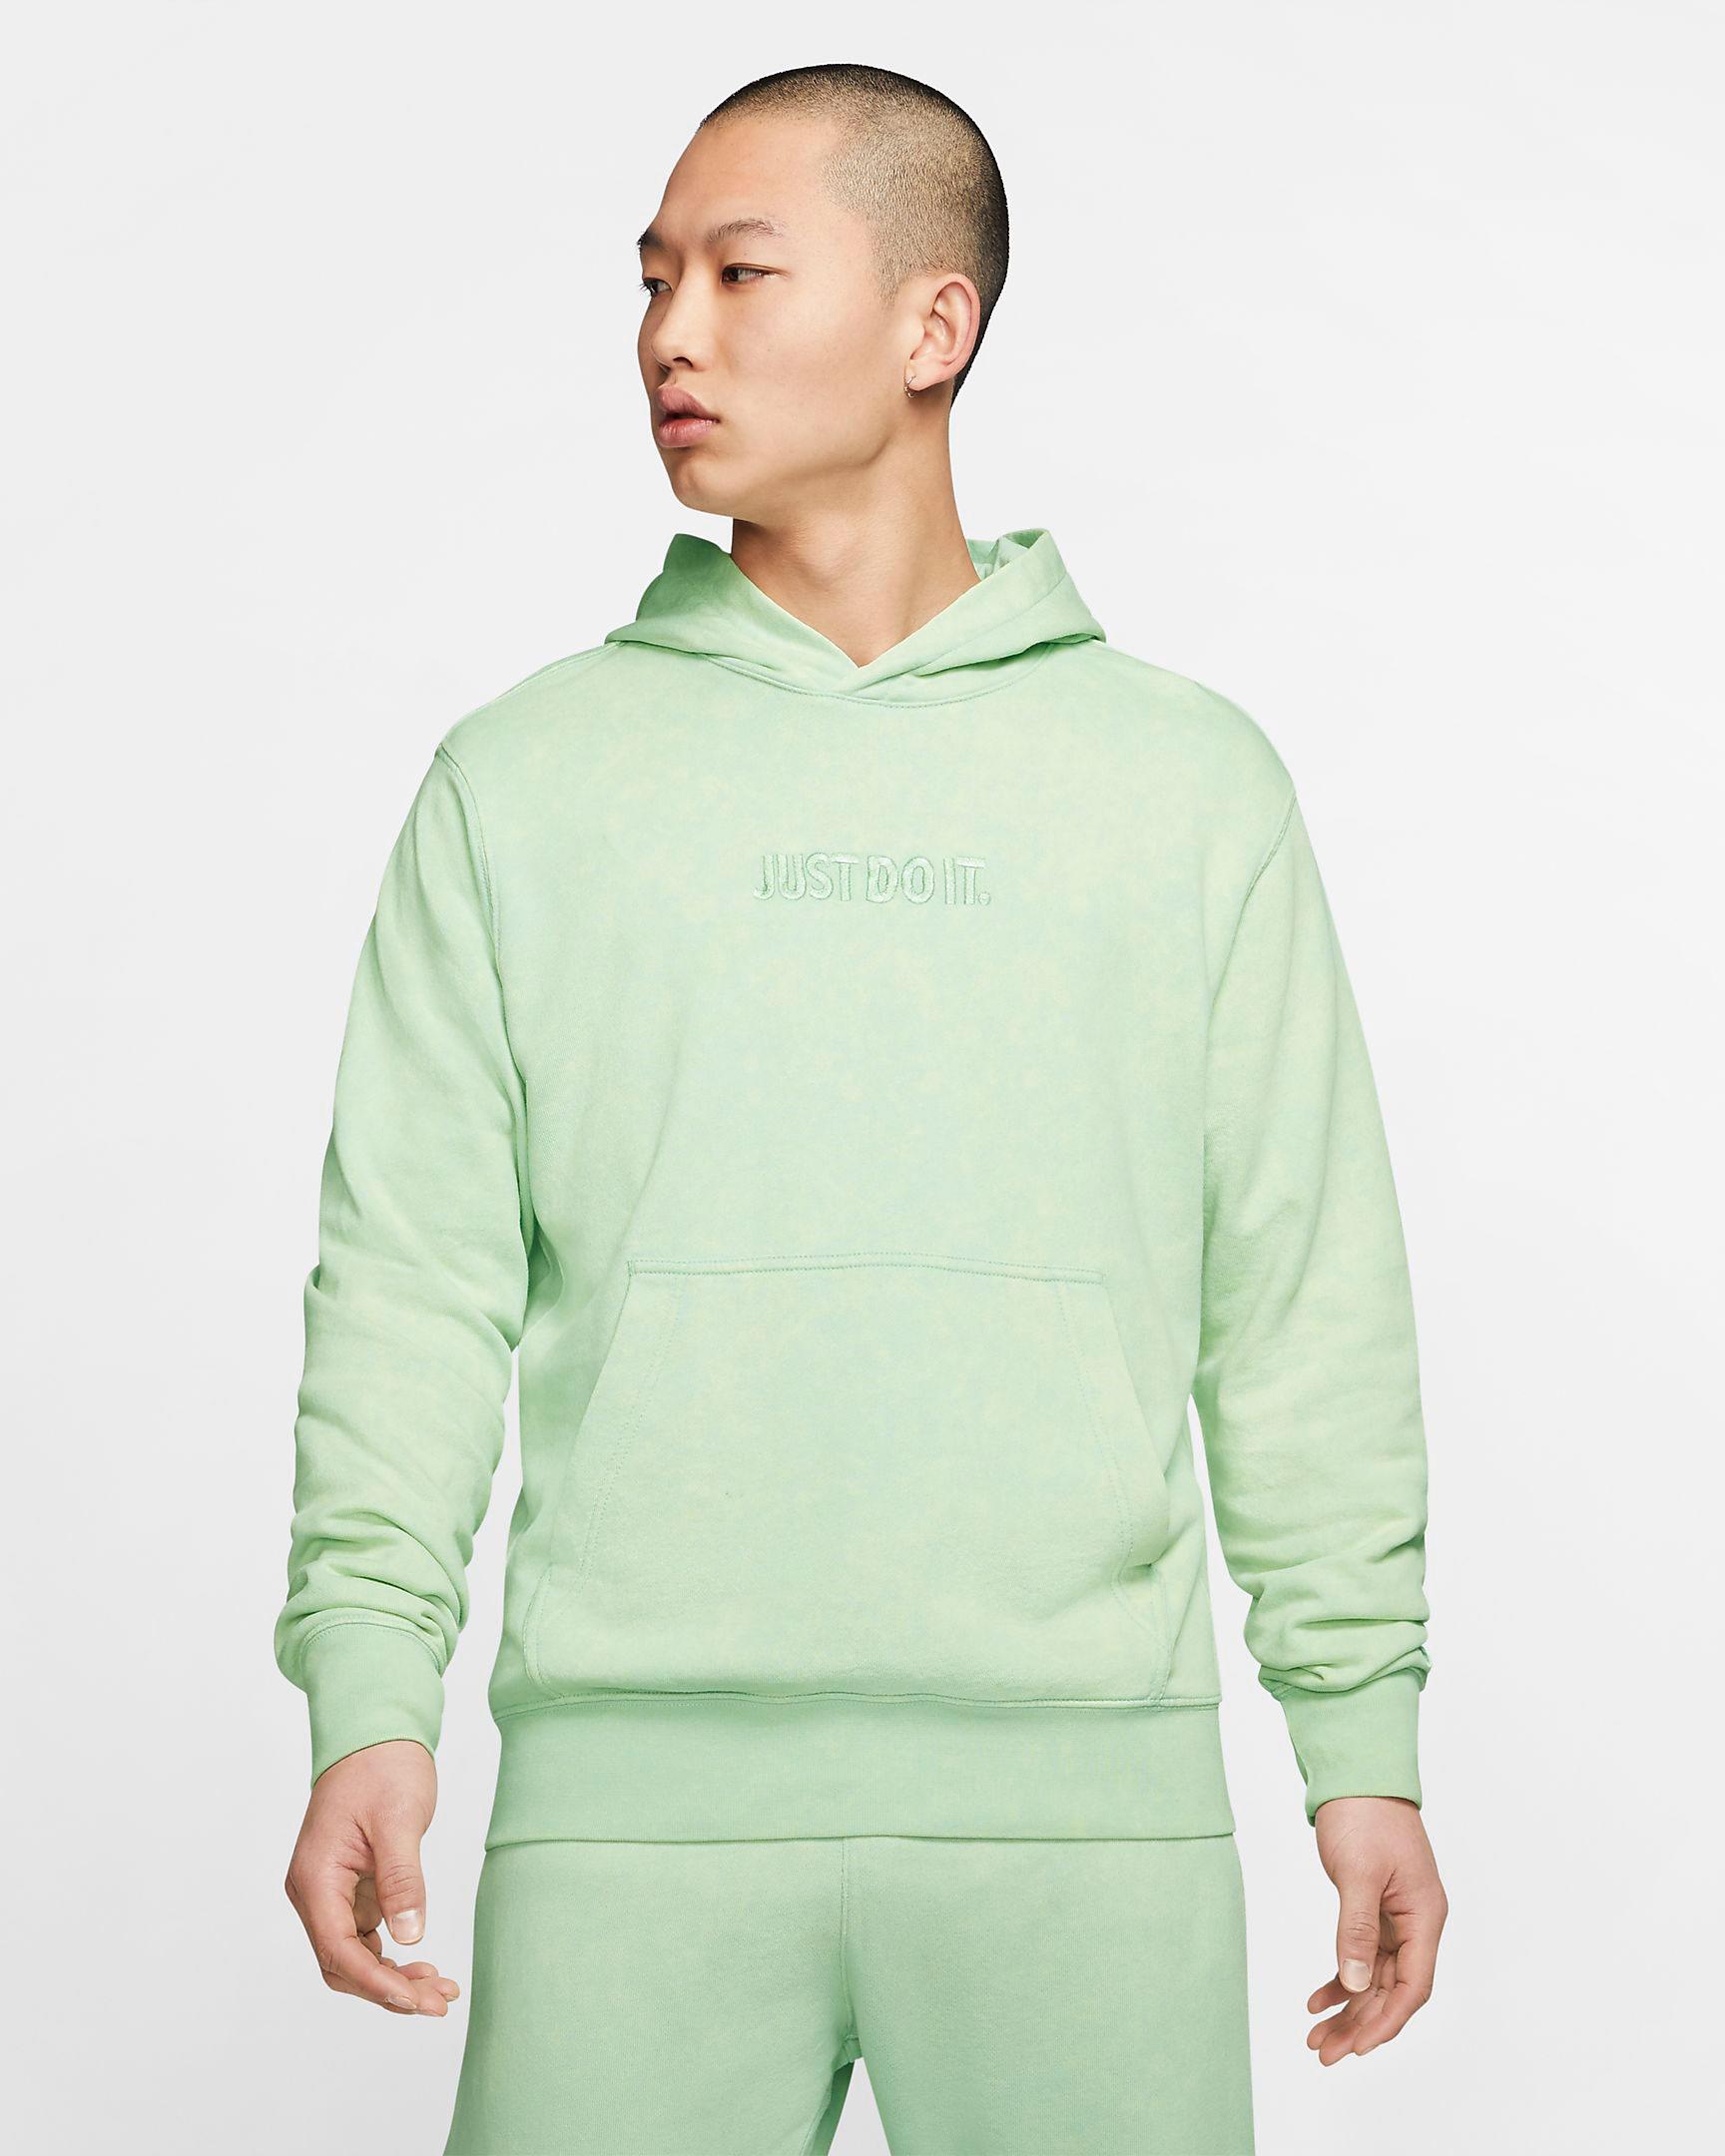 air-jordan-1-bio-hack-nike-green-hoodie-match